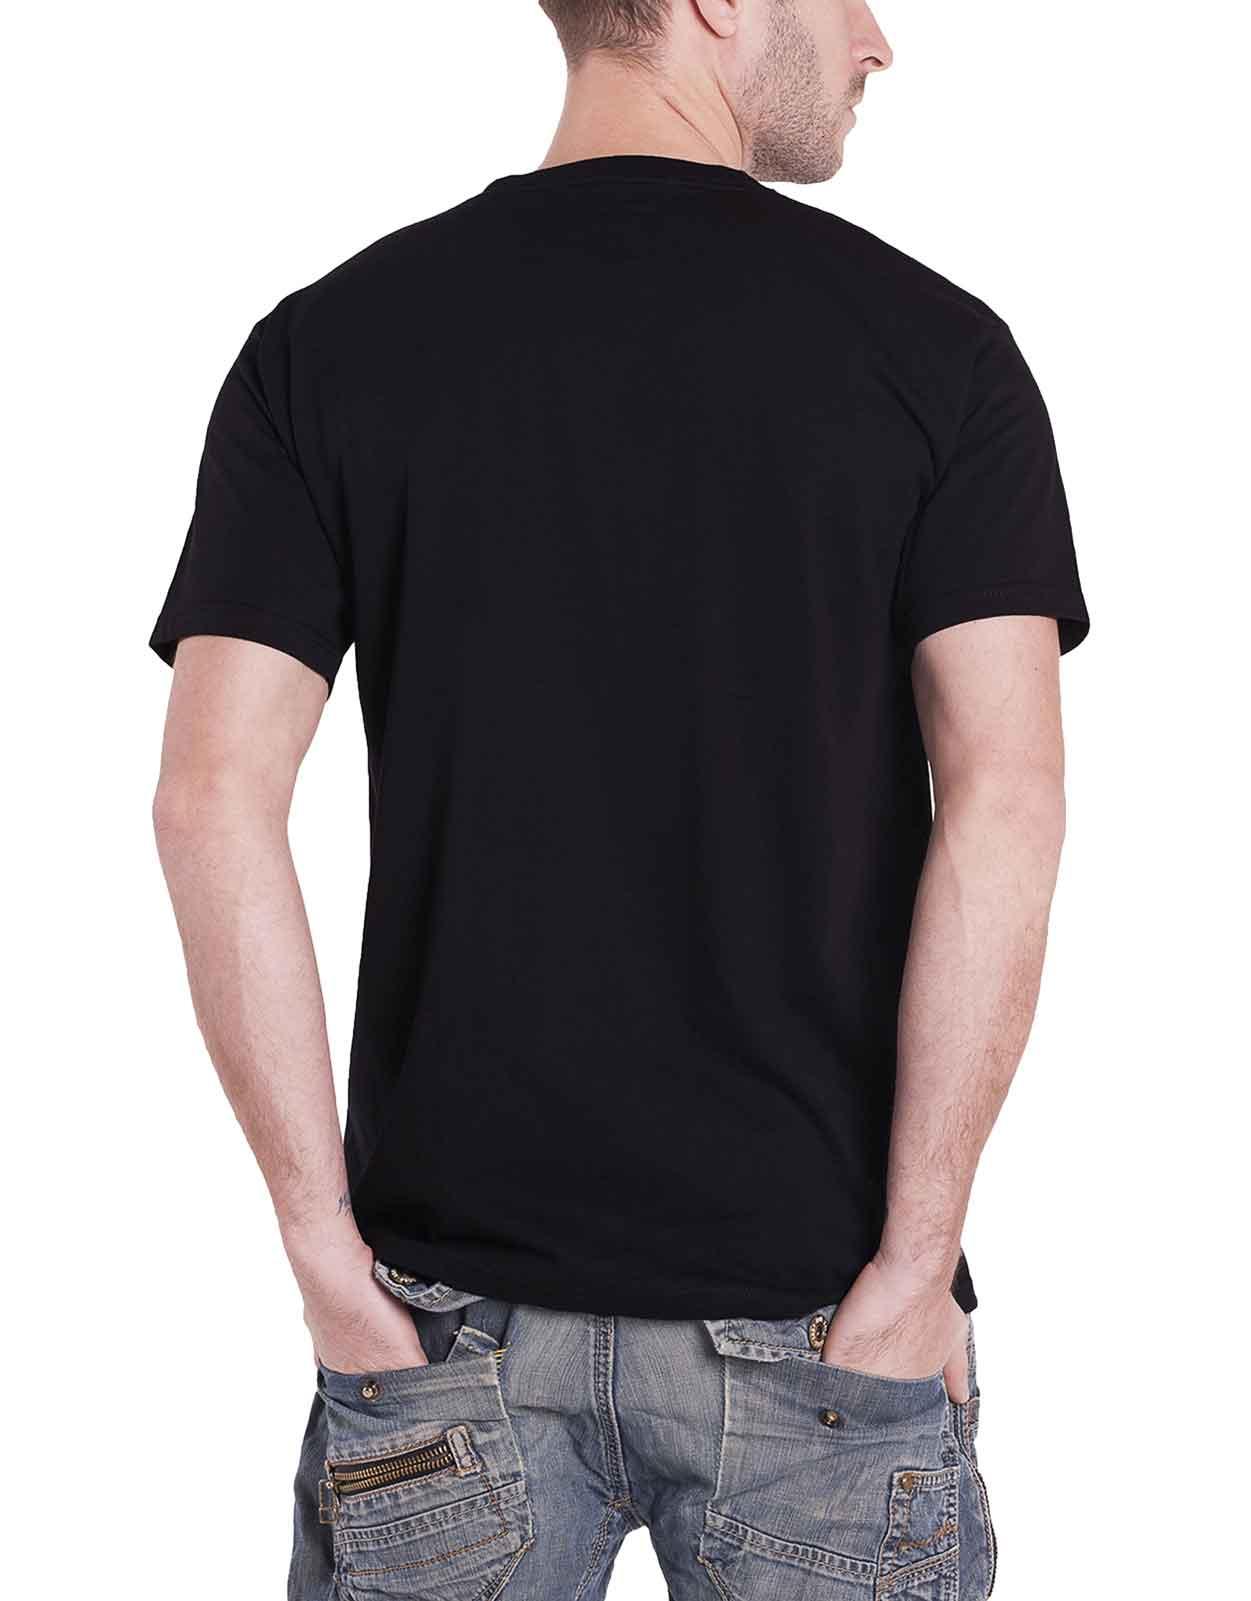 Motorhead-T-Shirt-Lemmy-RIP-England-warpig-clean-your-clock-official-new-mens Indexbild 72